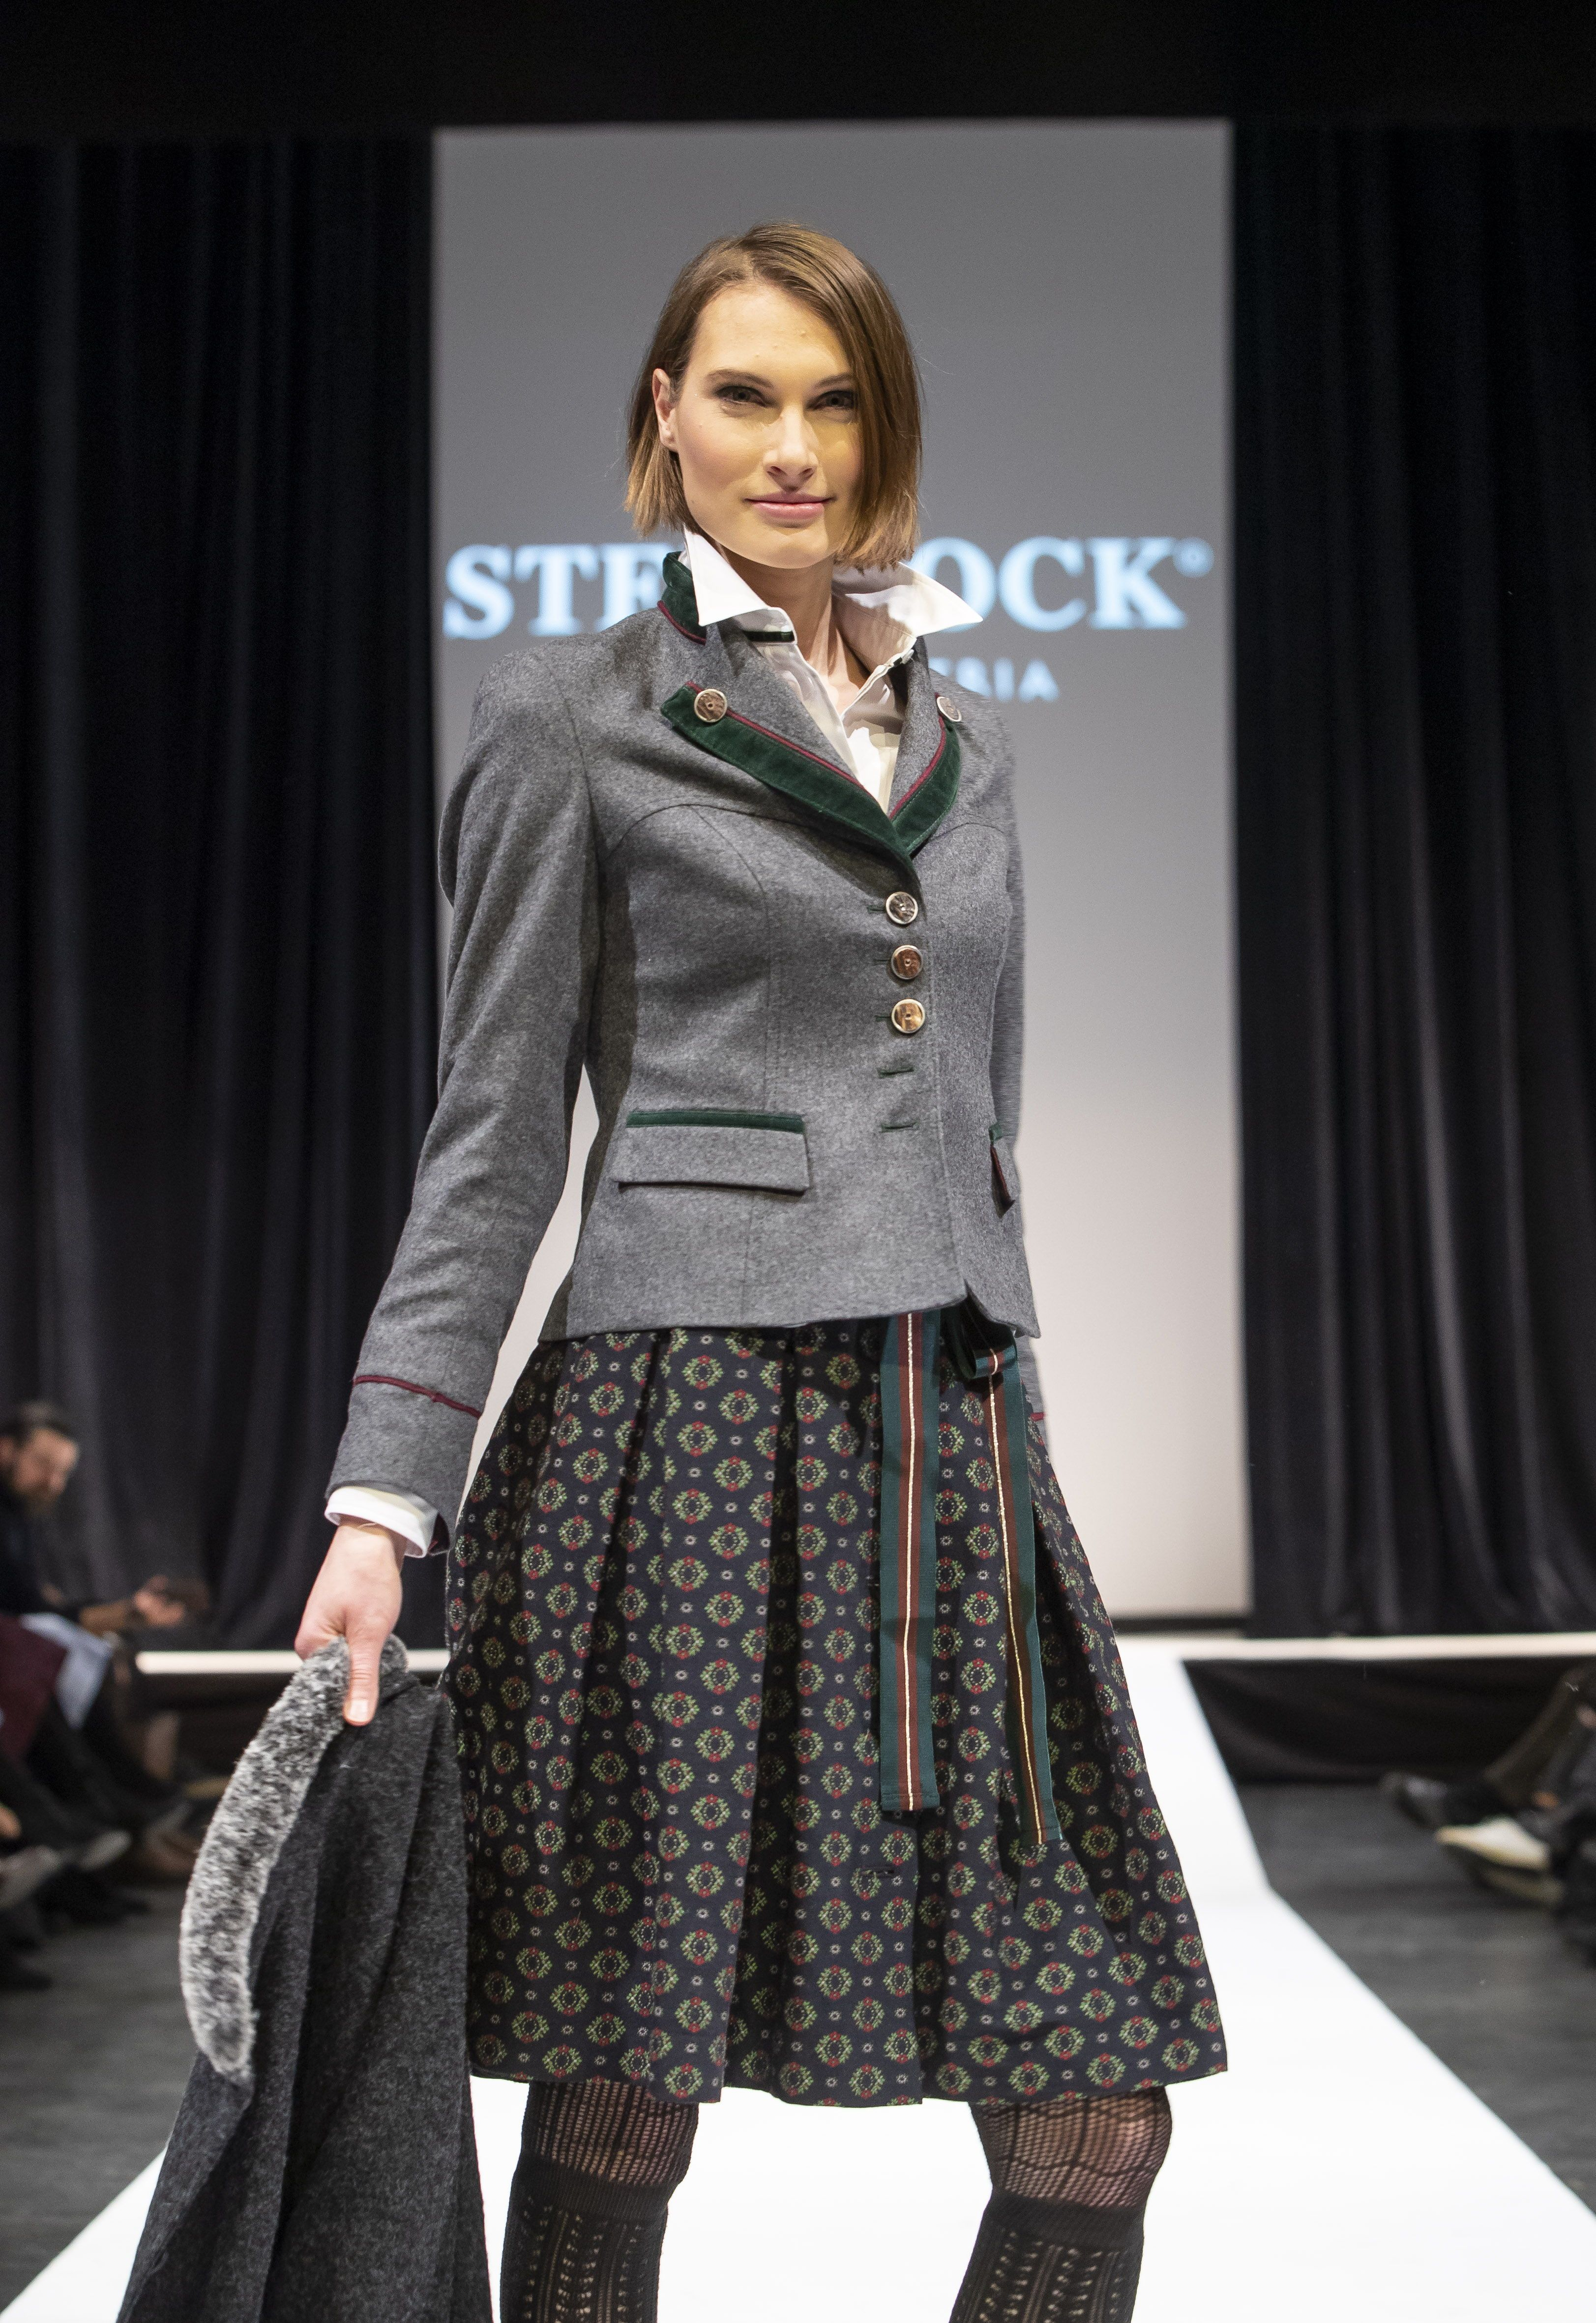 Trachtentrends Herbst 2019 | Modestil, Dirndl, Mode